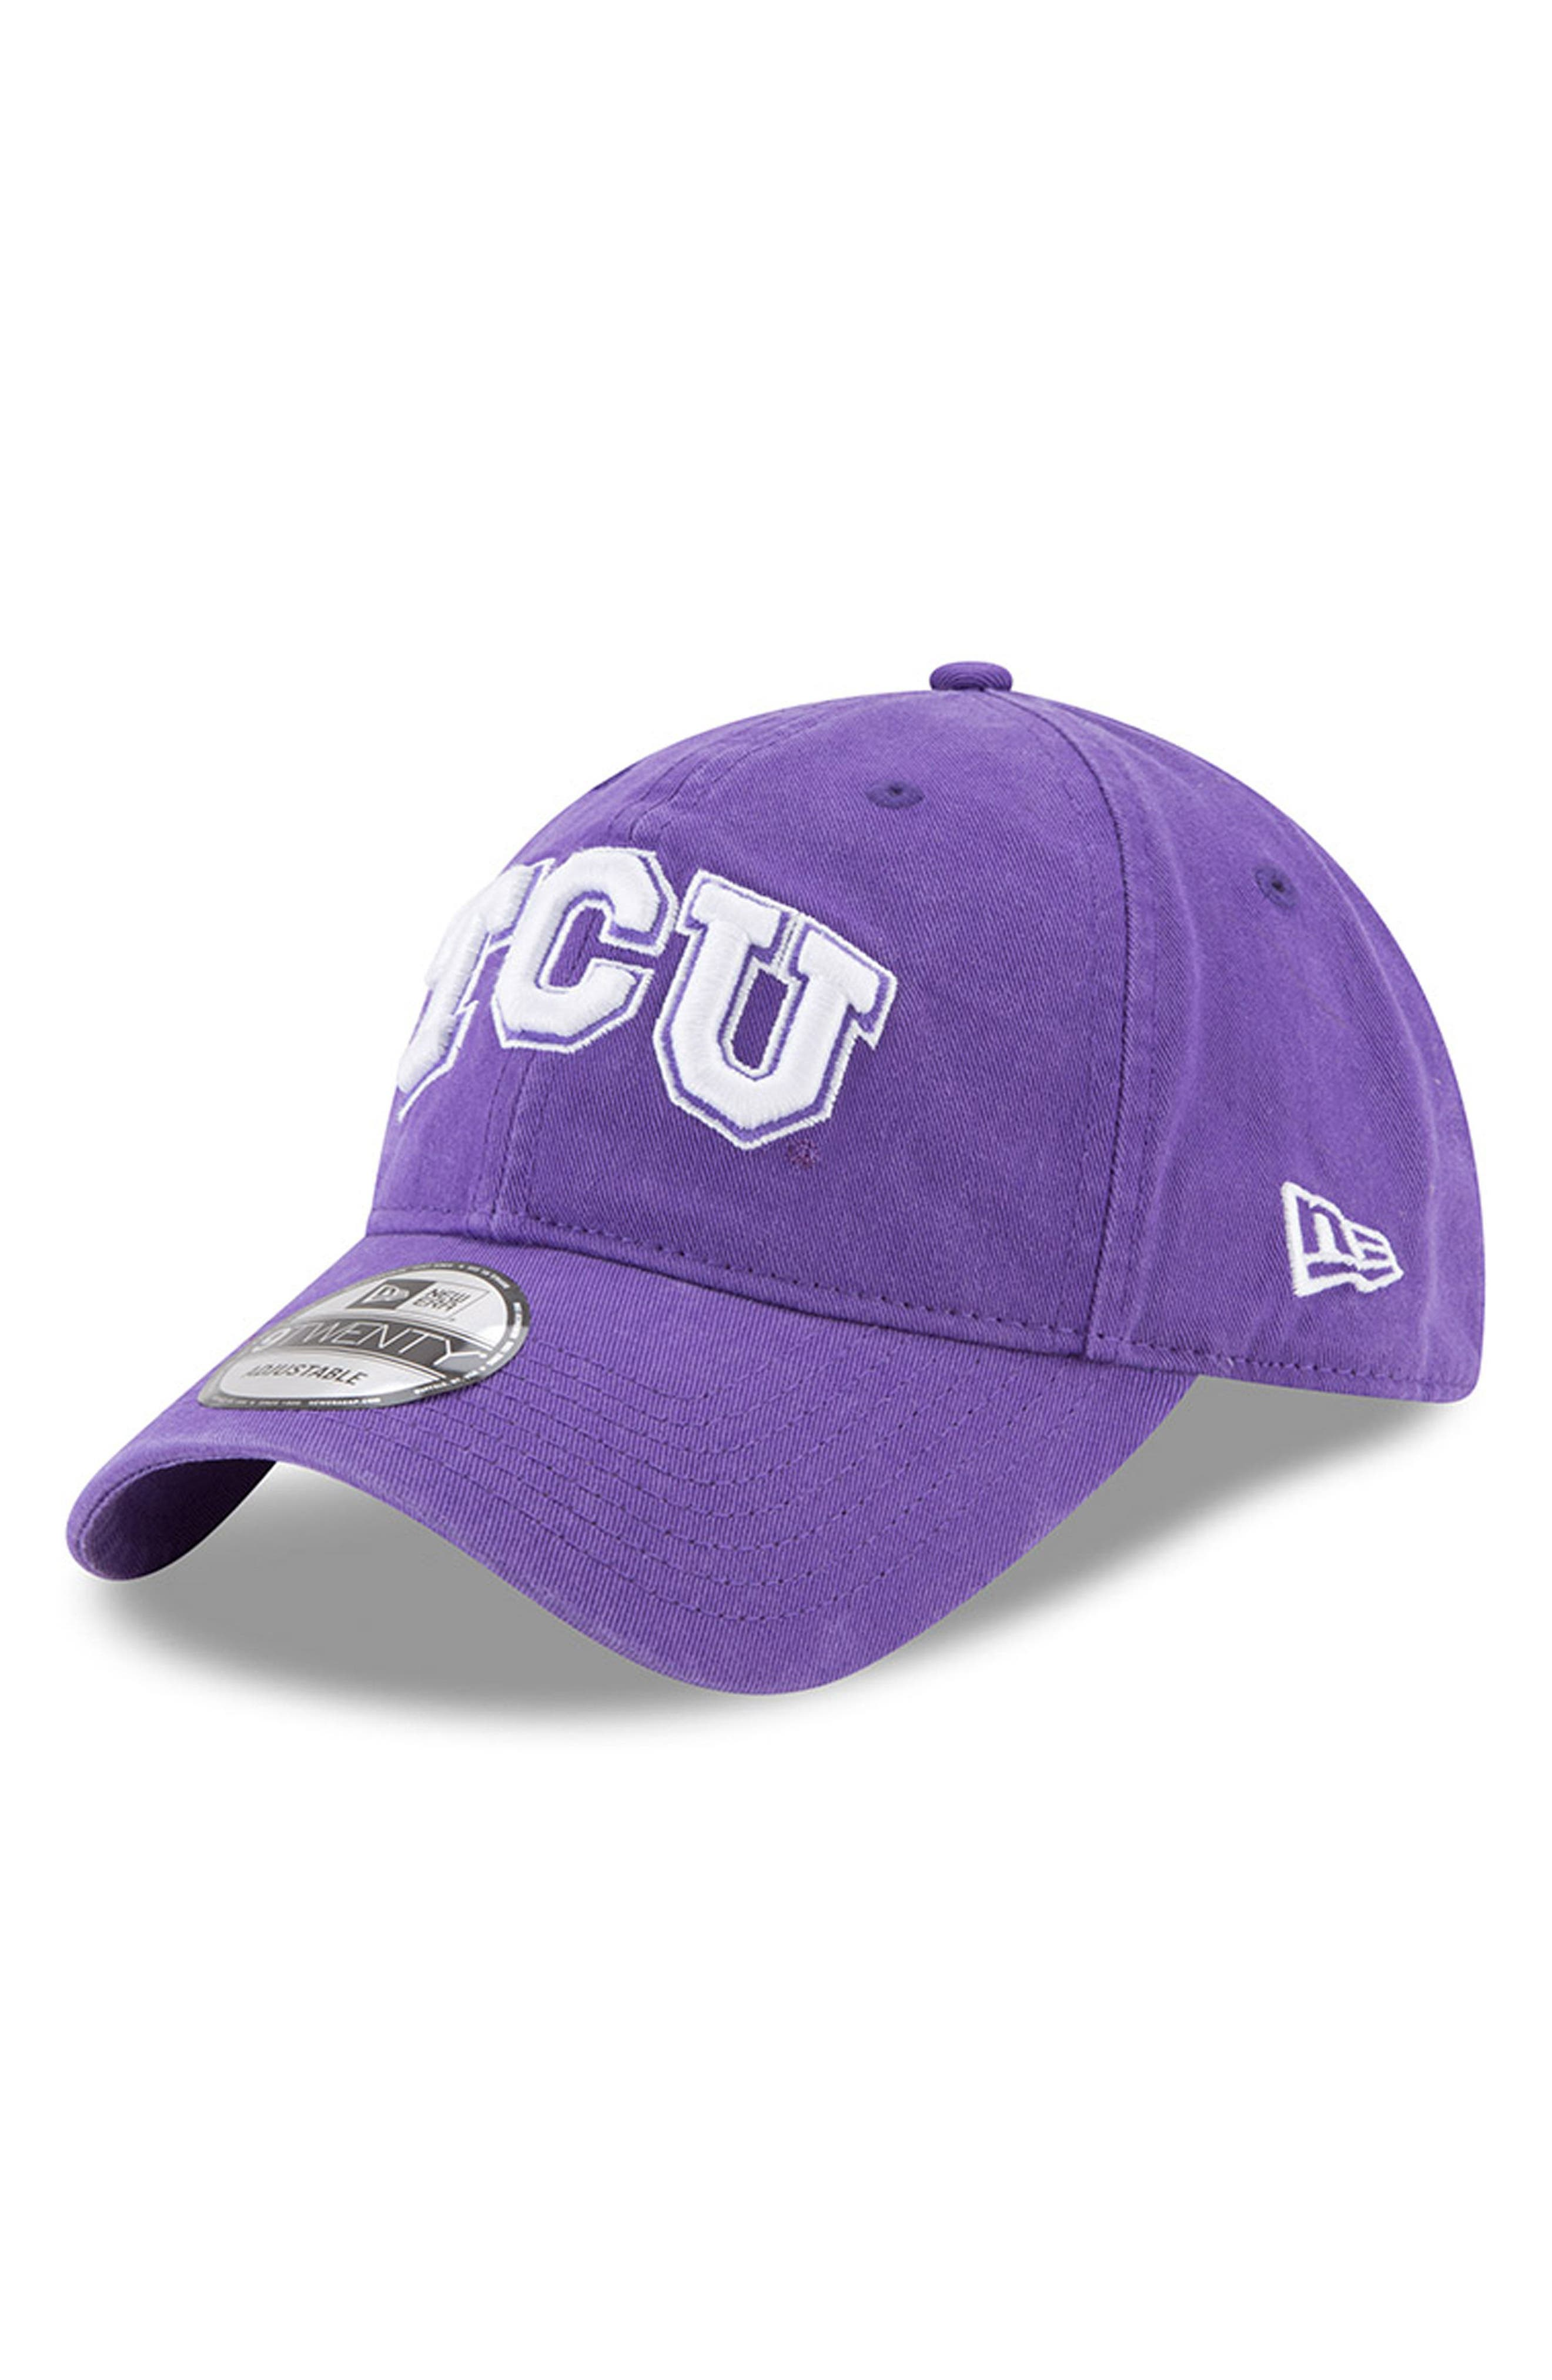 Collegiate Core Classic Baseball Cap,                             Main thumbnail 1, color,                             Tcu Horned Frogs